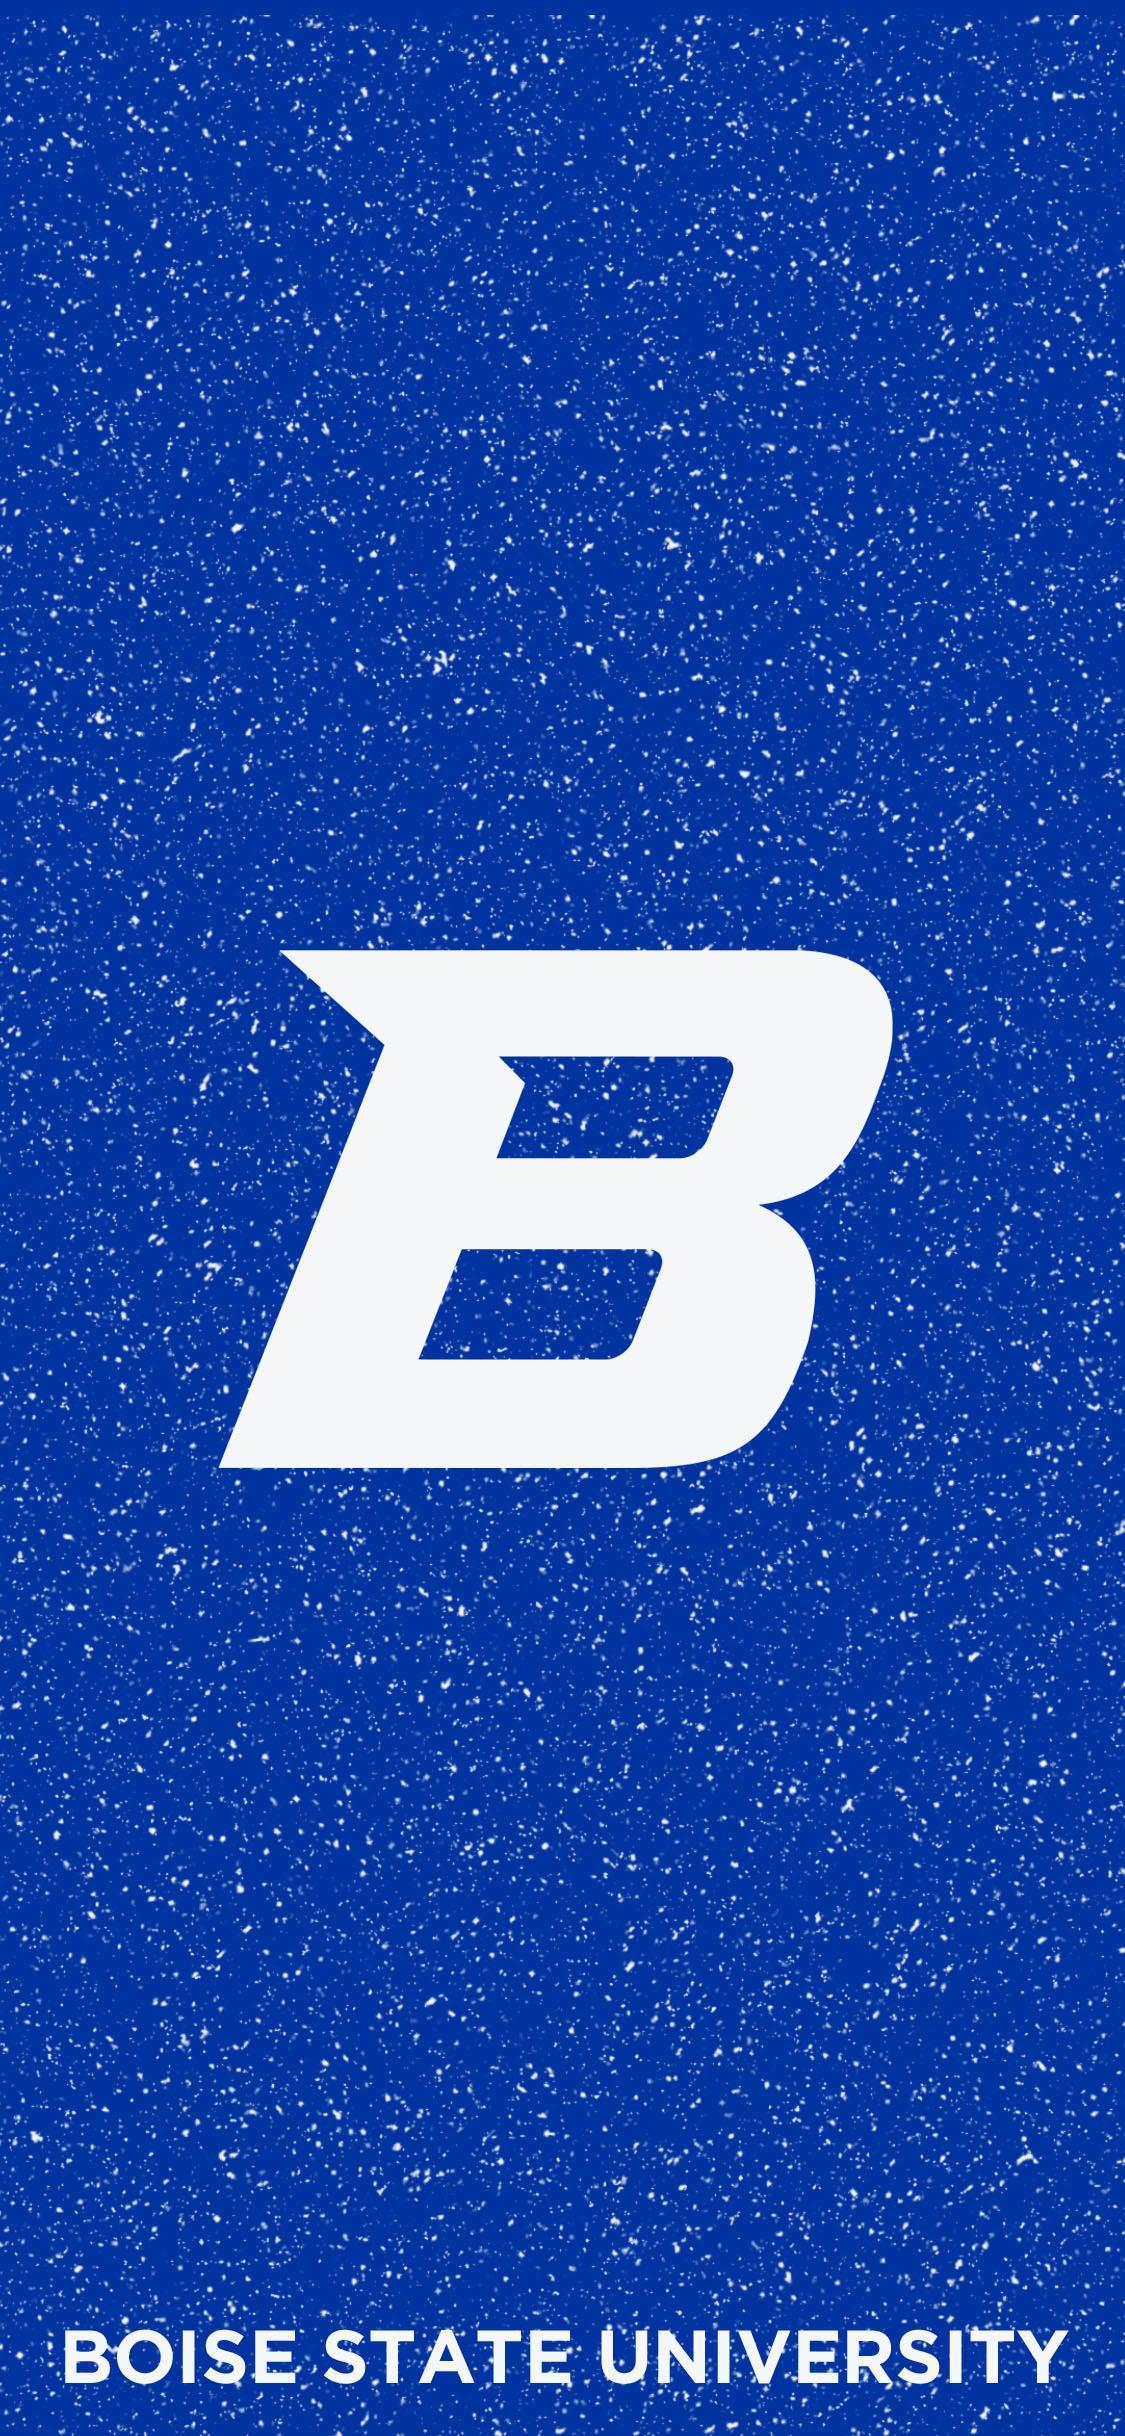 Boise State Blue Speckled Wallpaper